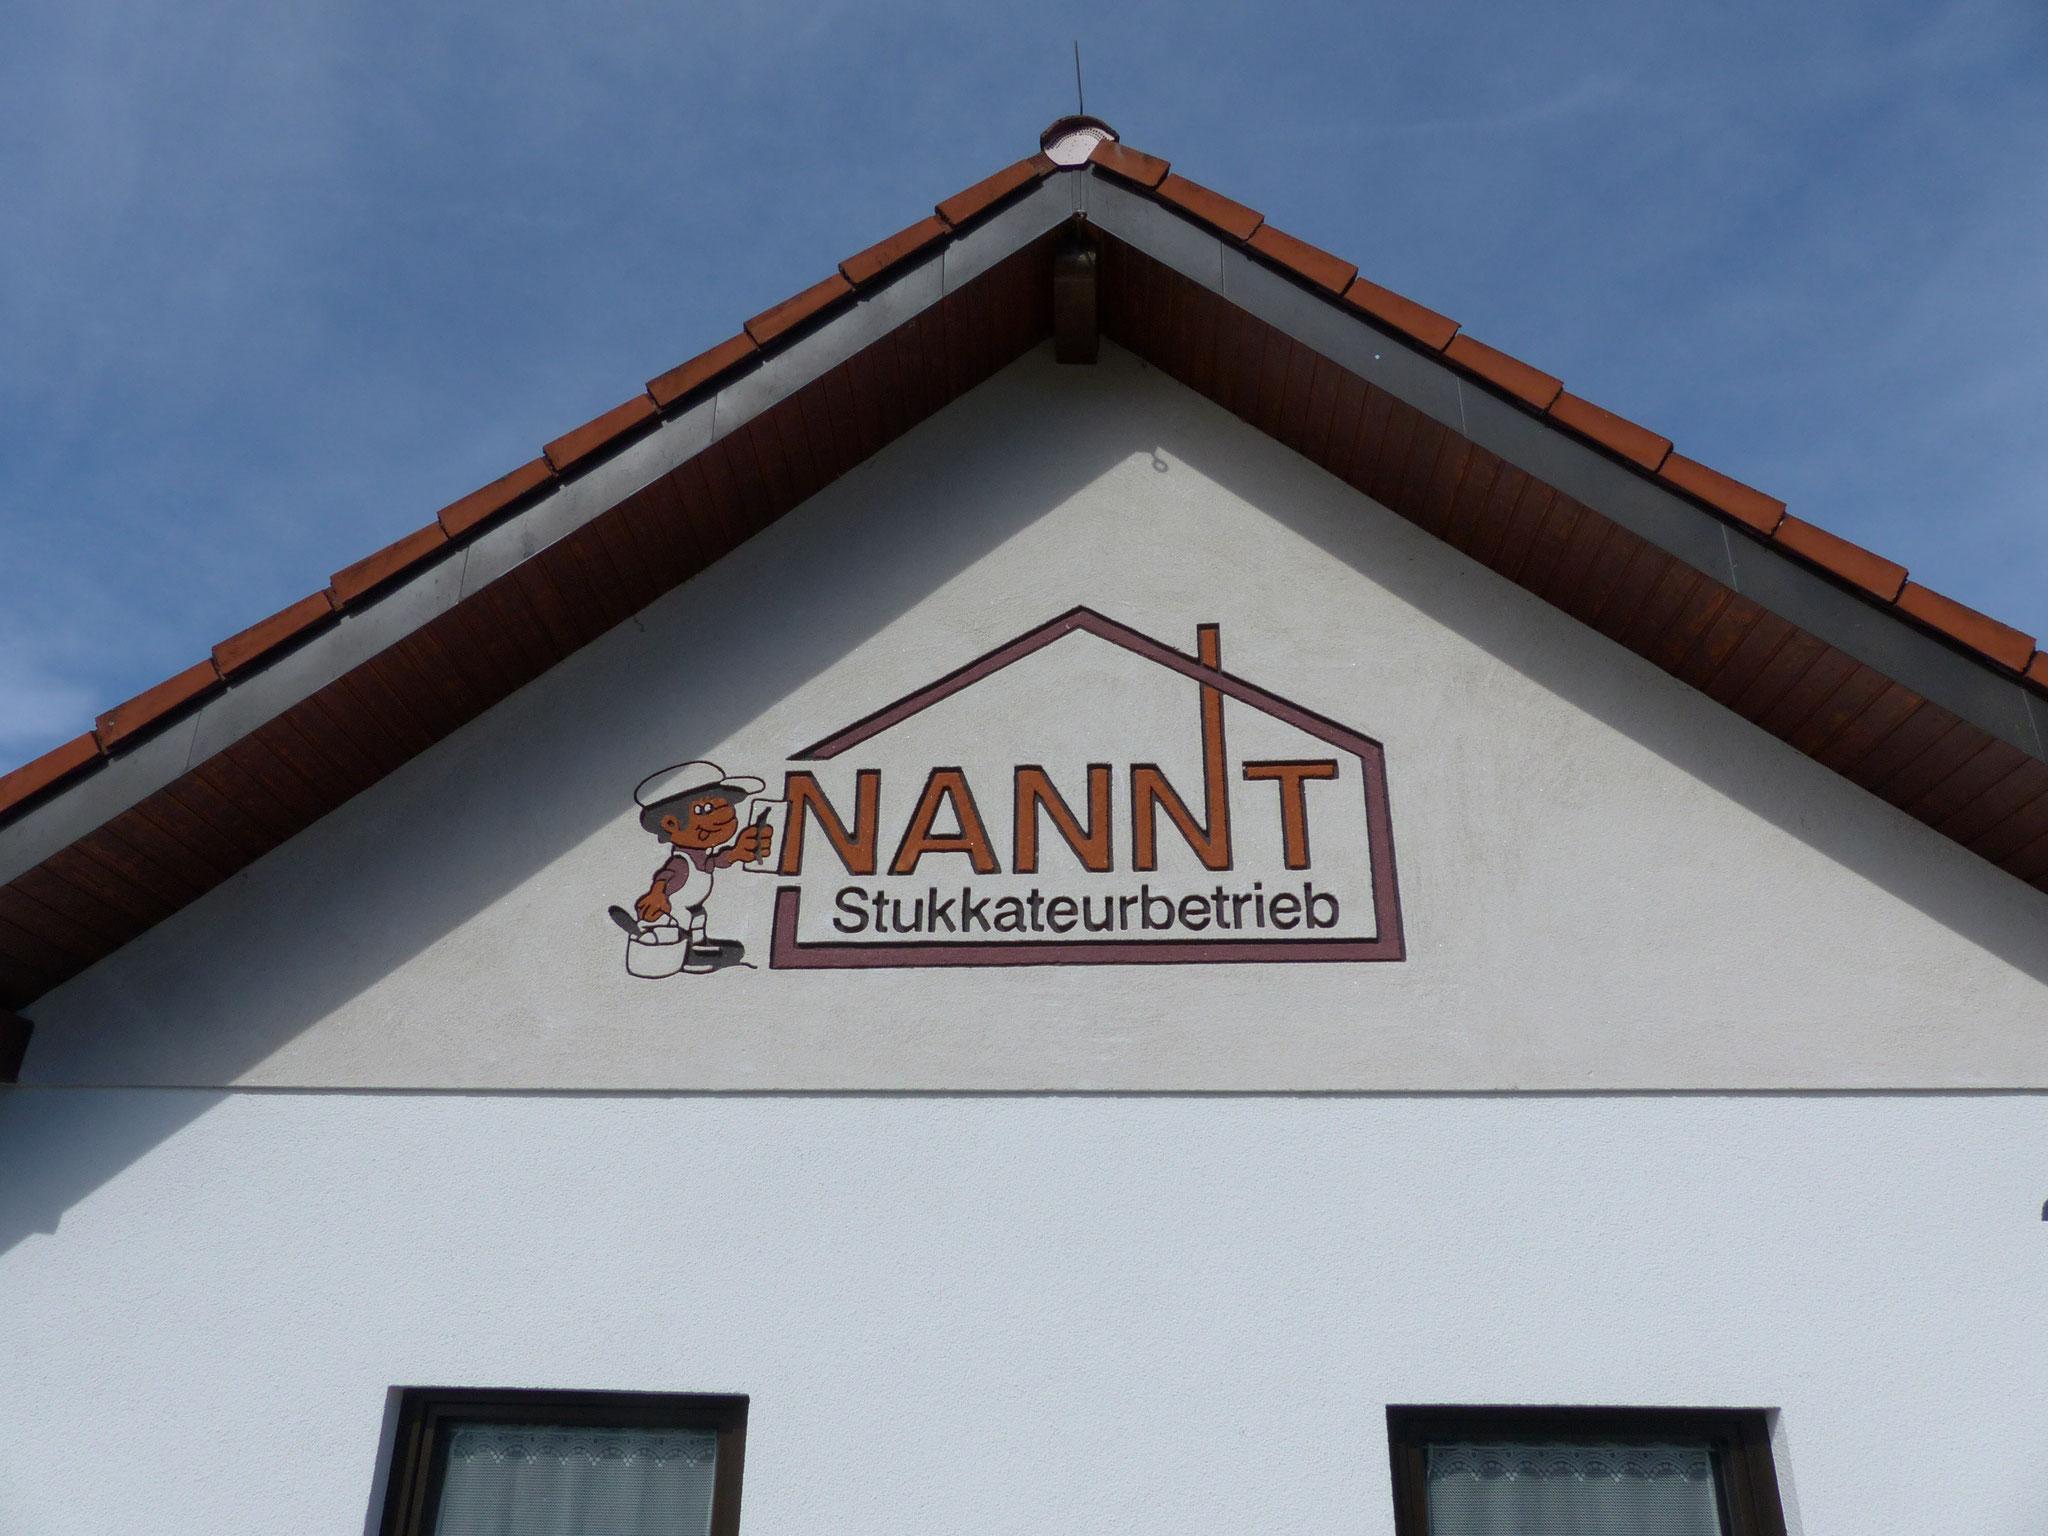 Fassade mit Firmenlogo